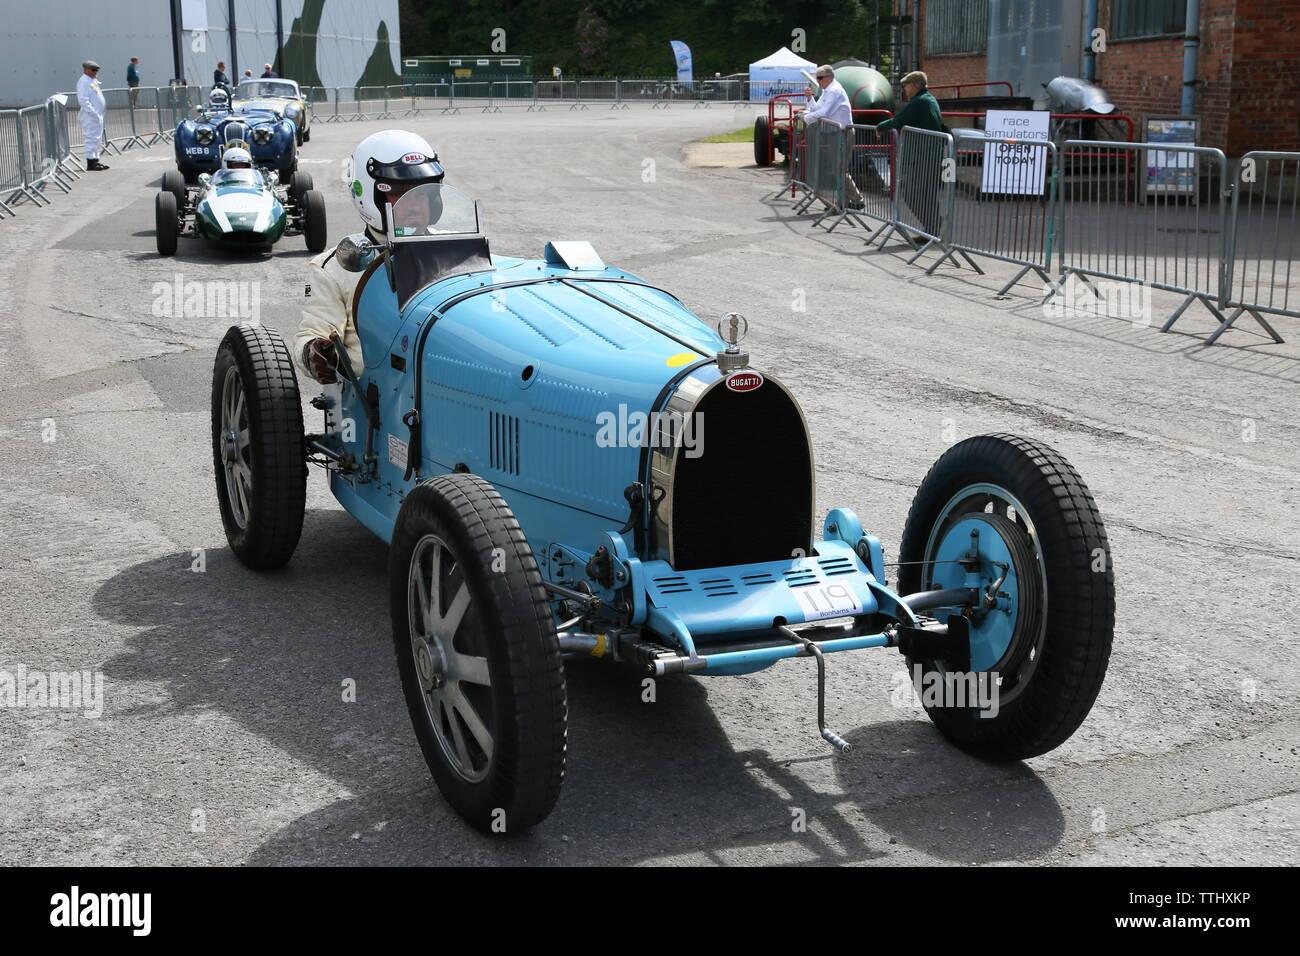 Bugatti Type 35C (1927), Double Twelve Motorsport Festival 2019, Brooklands Museum, Weybridge, Surrey, England, Great Britain, UK, Europe - Stock Image